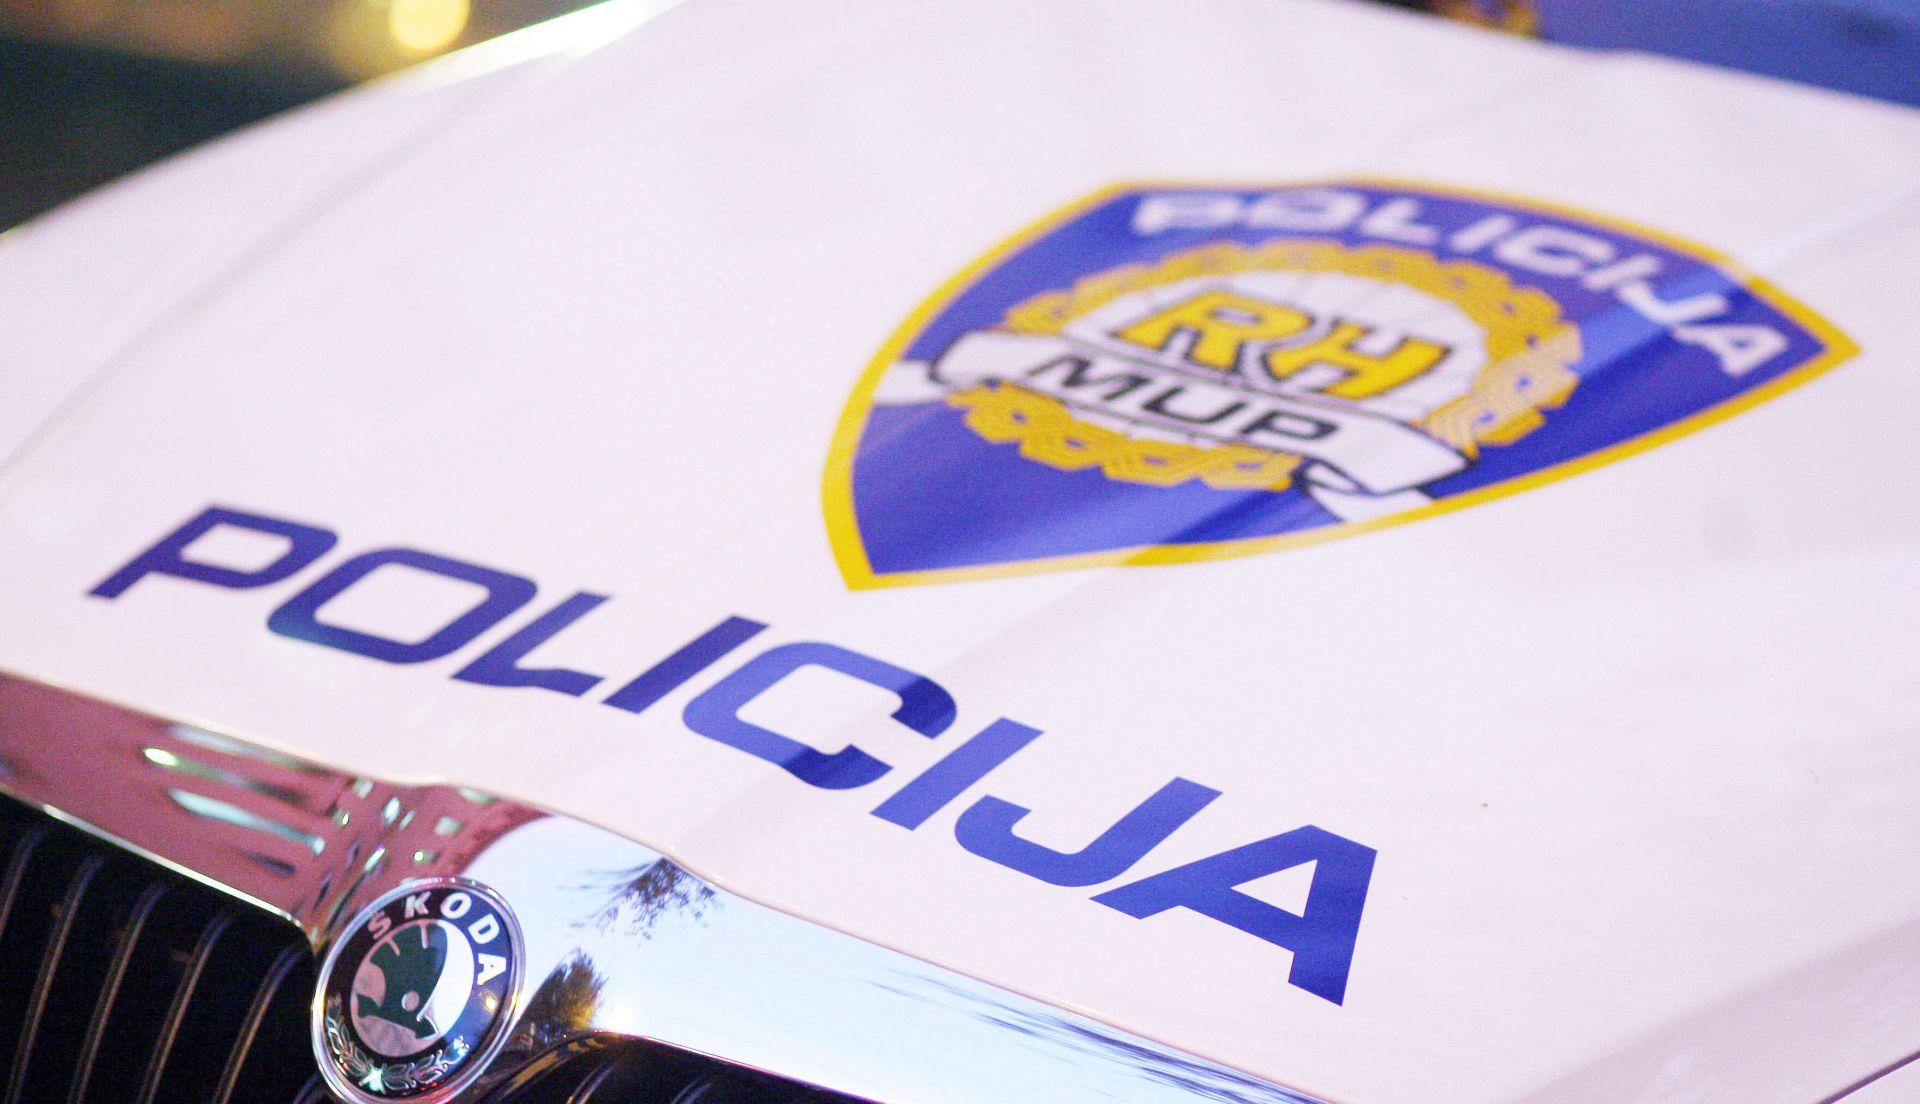 MITO OD ĐORĐA VULETIĆA? Uhićen zagrebački tužitelj